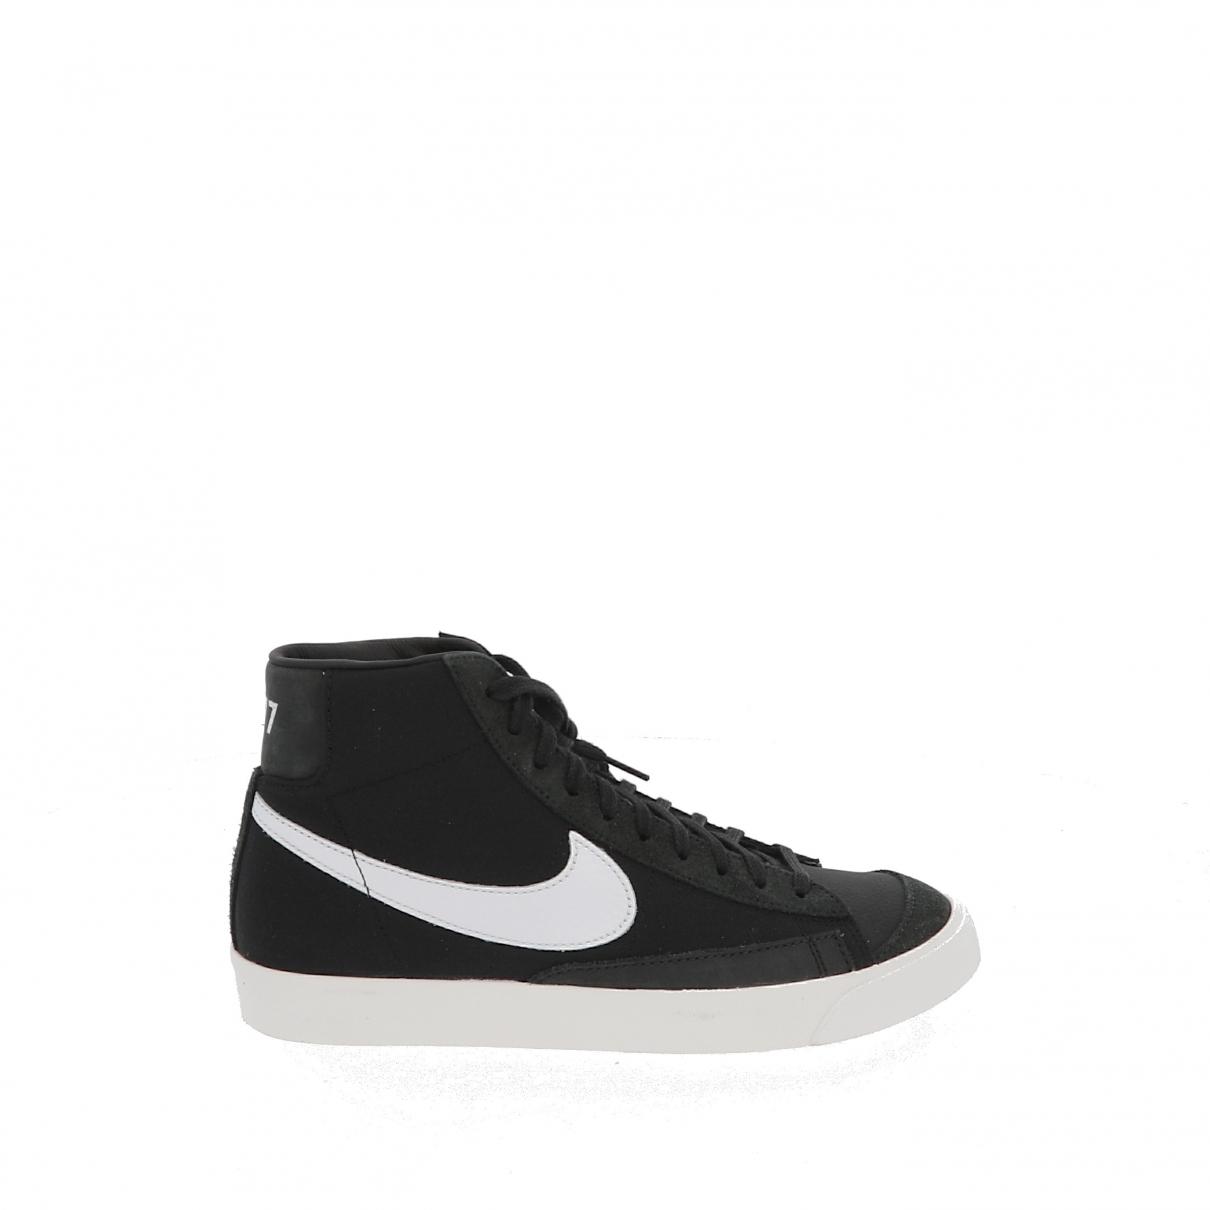 Nike Blazer Sneakers in  Schwarz Leder